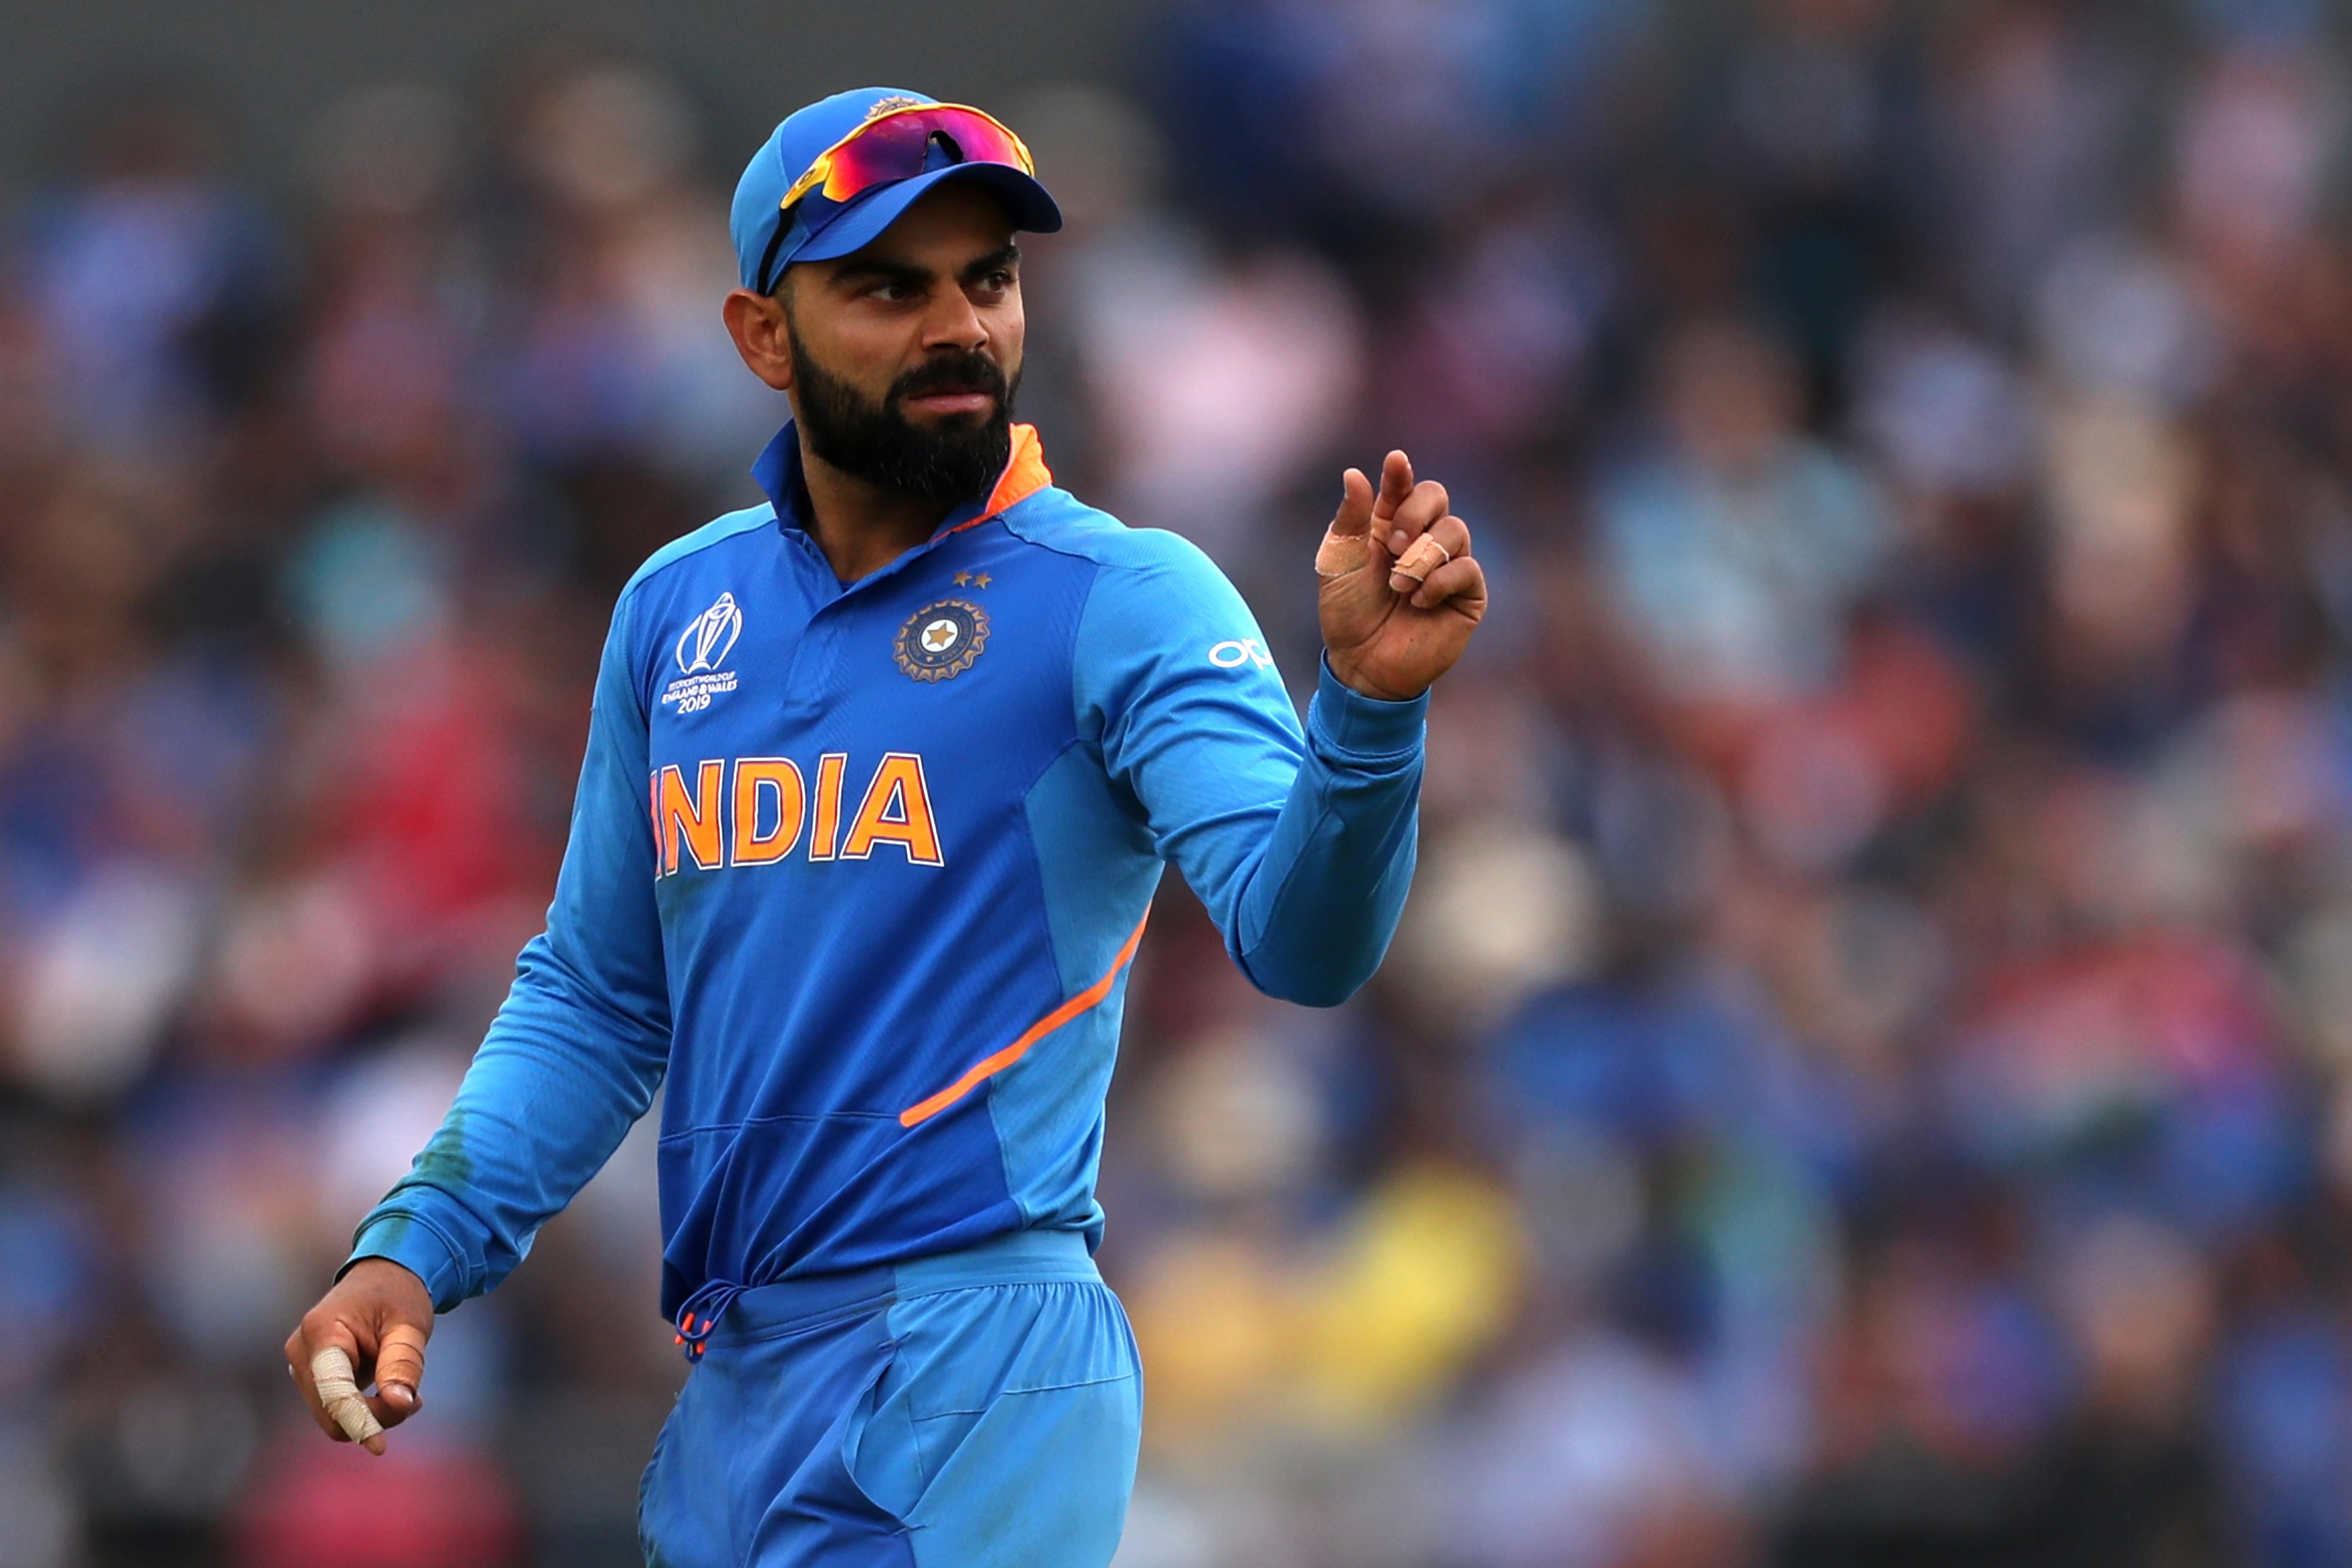 Kohli's India need to win big tournaments, says Ganguly